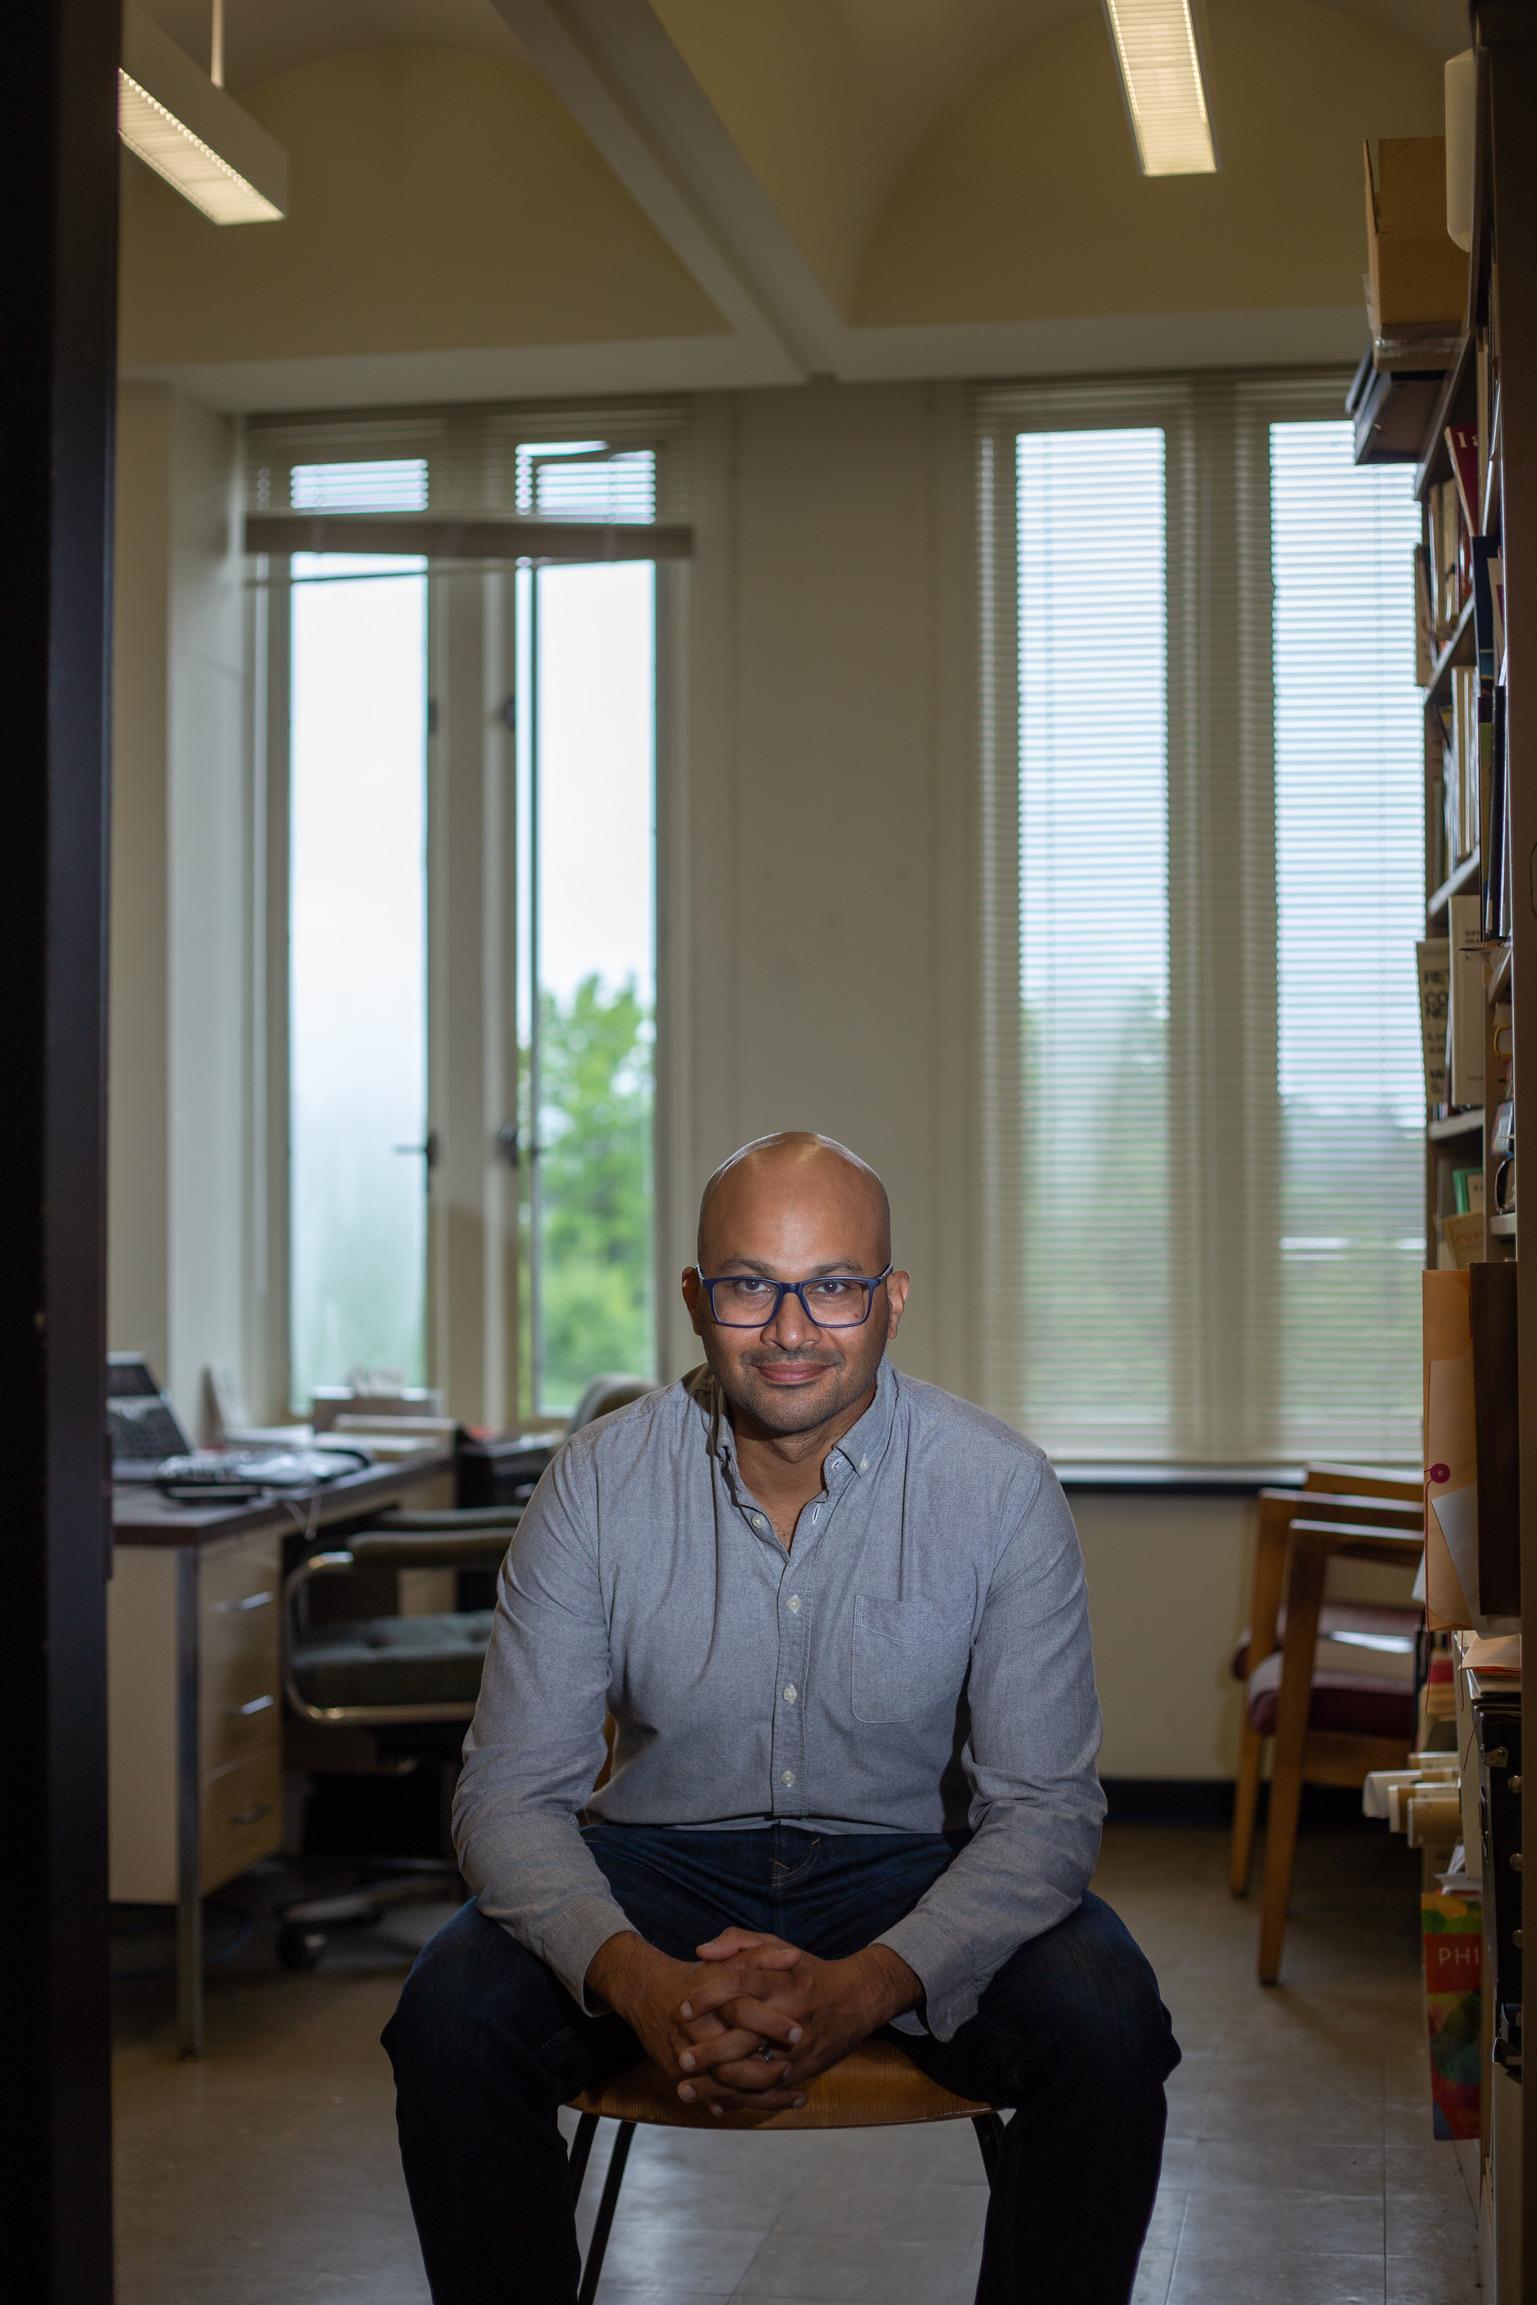 August 19, 2021 - Portrait of Jason d'Cruz, professor of Philosophy